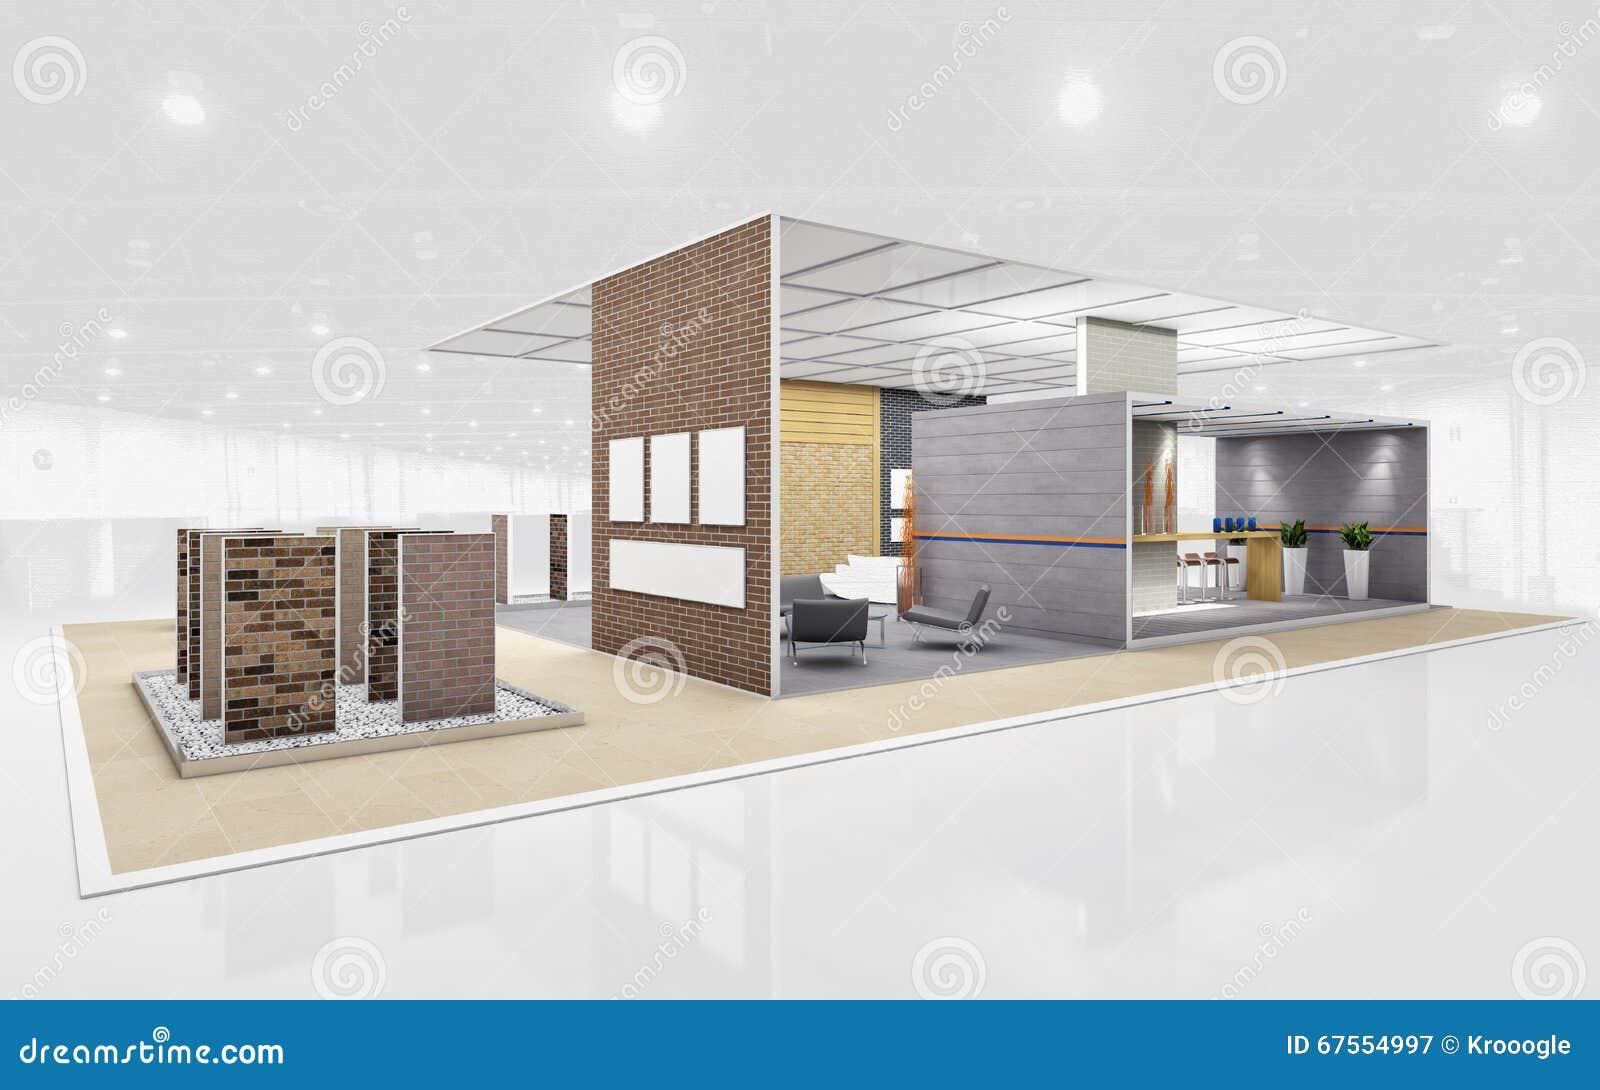 D Rendering Exhibition : Brick exhibition stand d rendering stock illustration